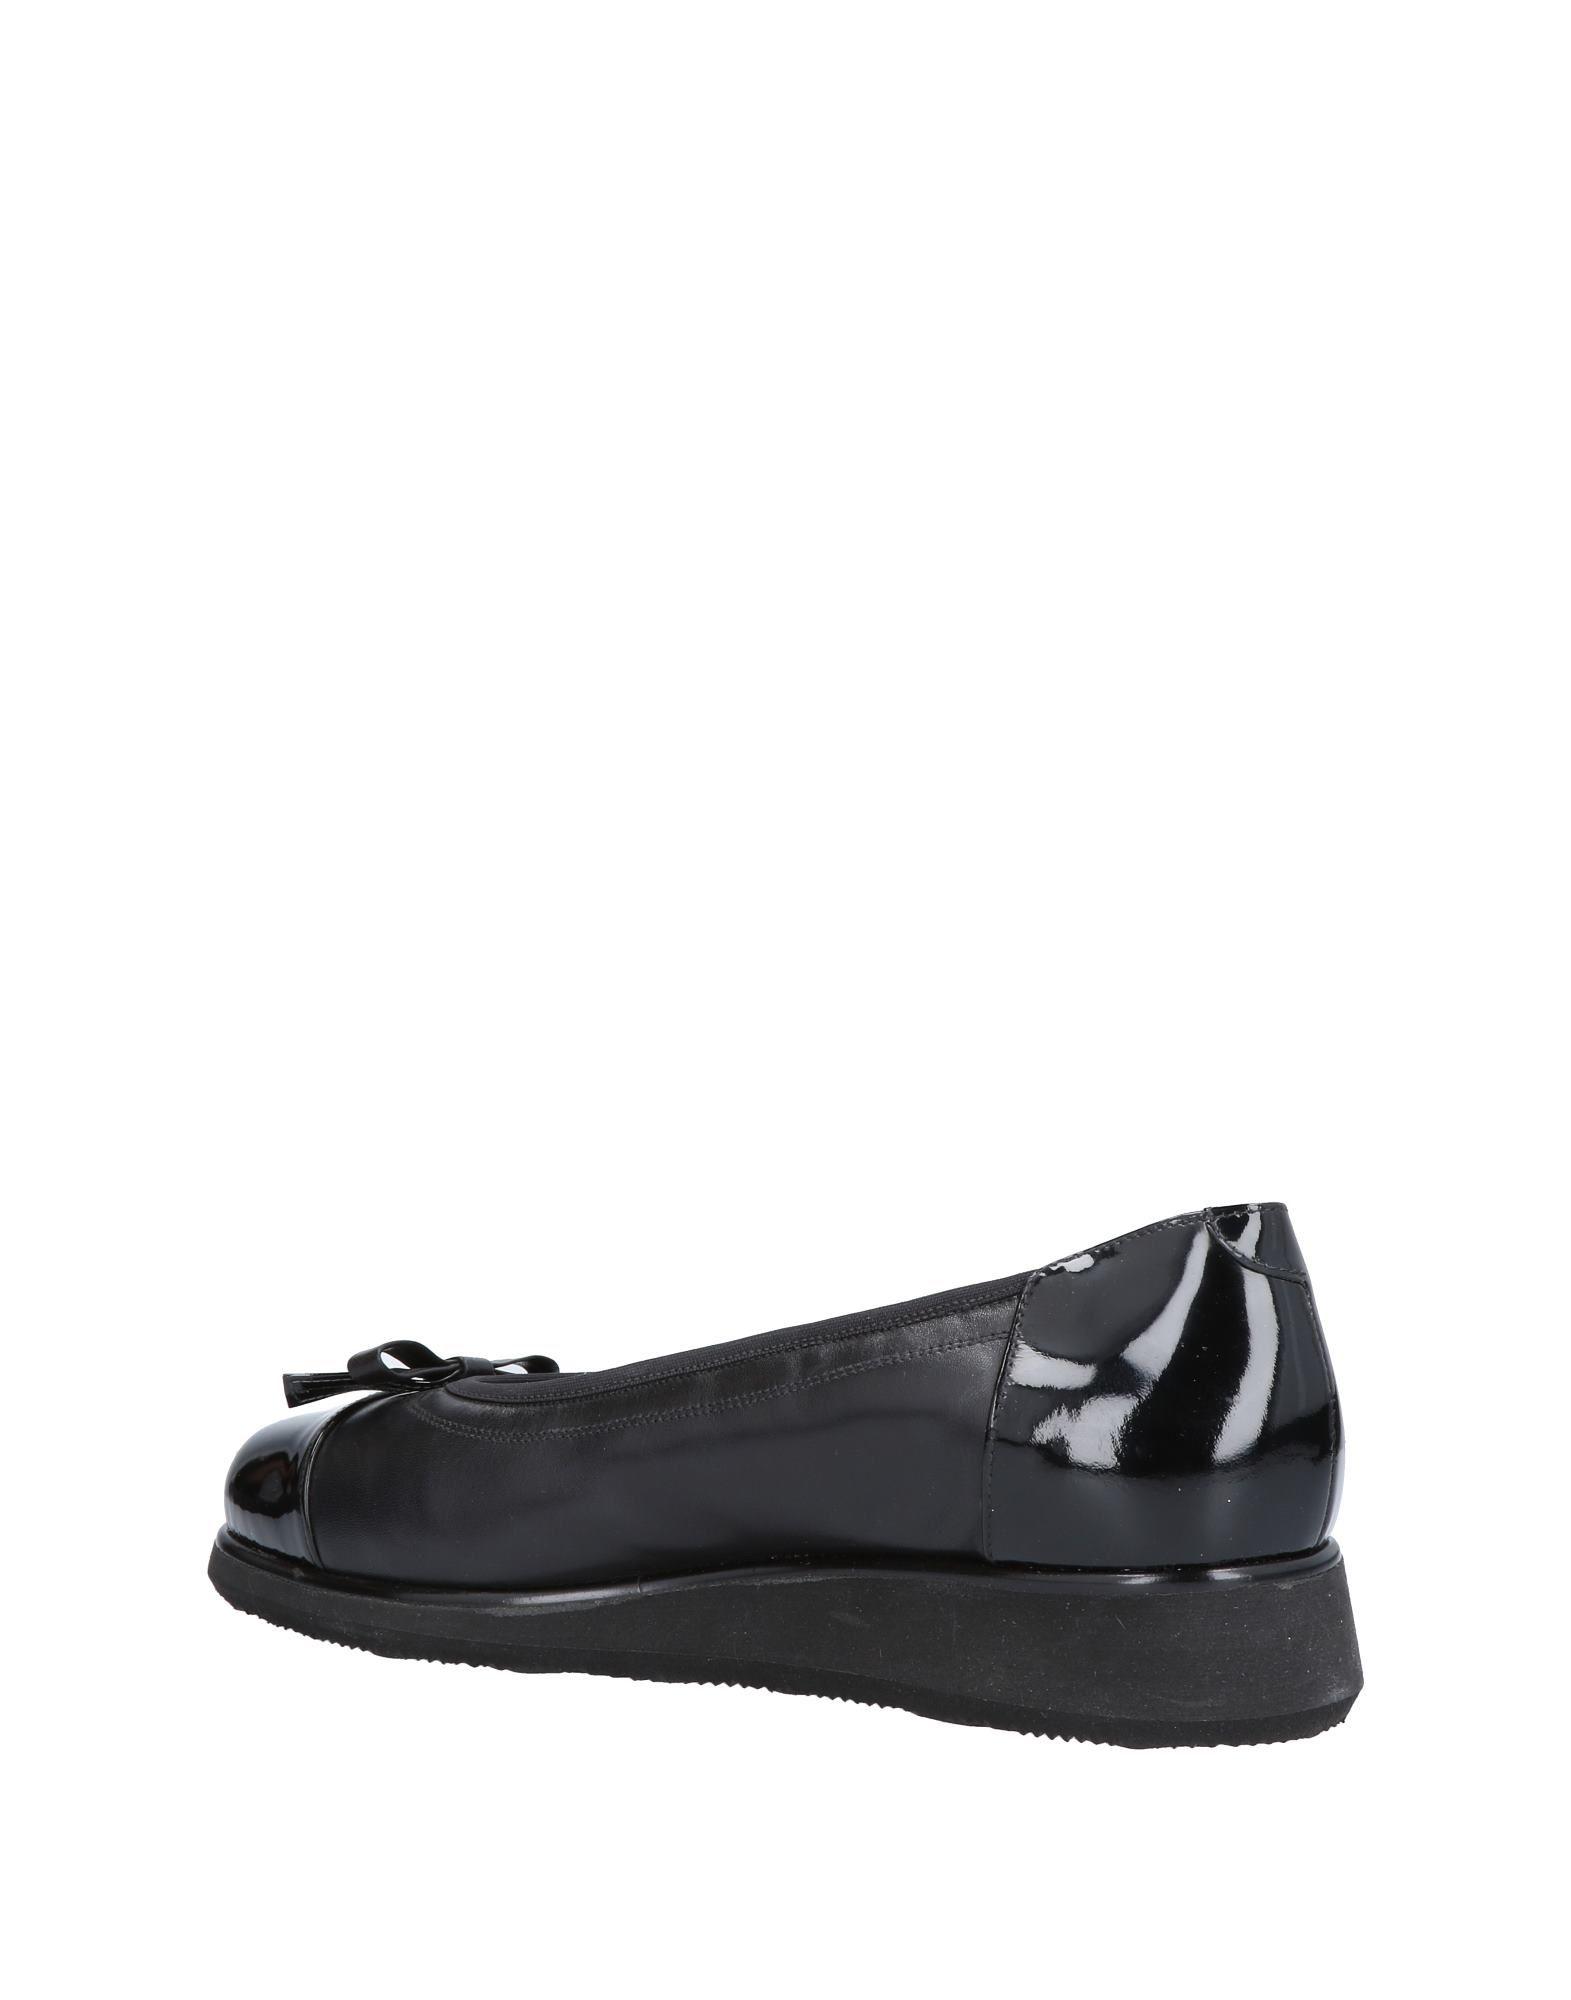 Meazzo Gute Pumps Damen  11481766AL Gute Meazzo Qualität beliebte Schuhe 4047b6